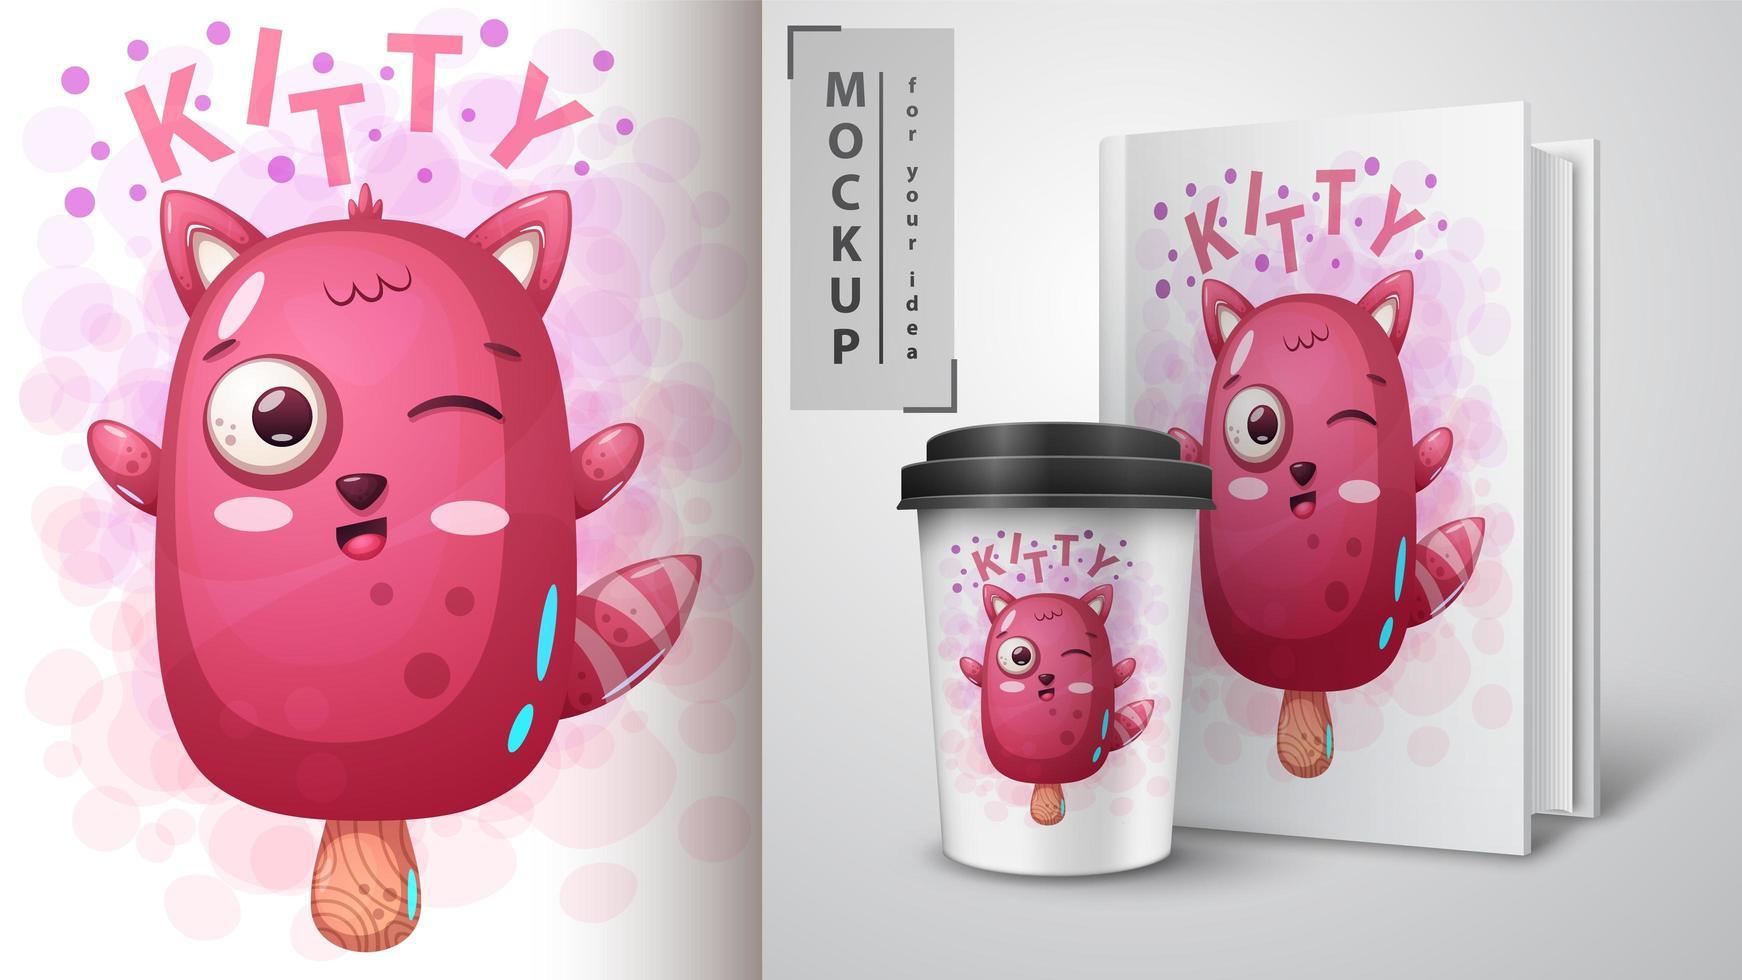 söt rosa kitty glass bar design vektor